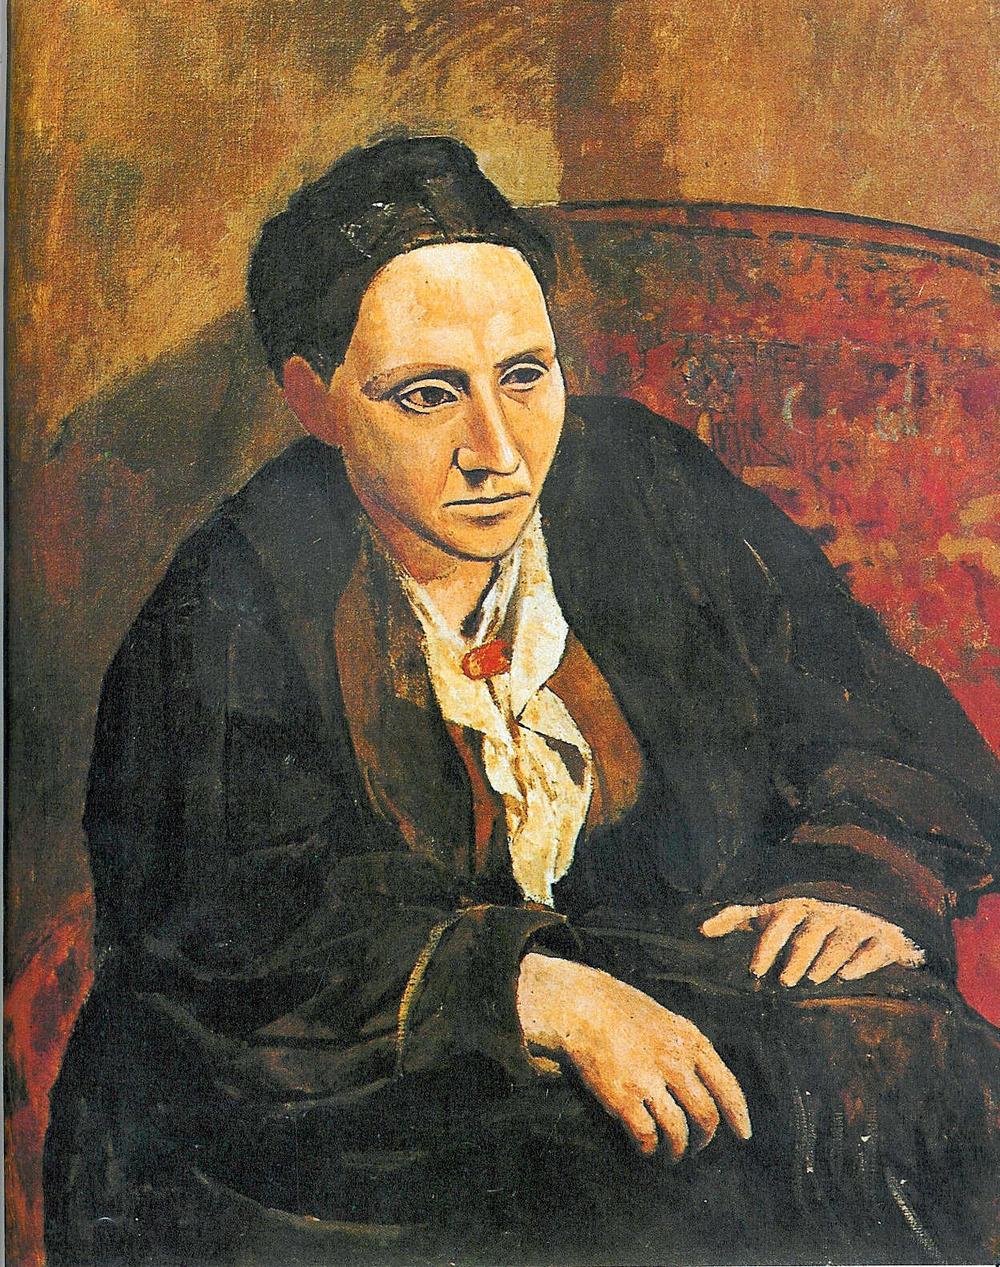 Gertrude Stein, by Pablo Picasso, 1906